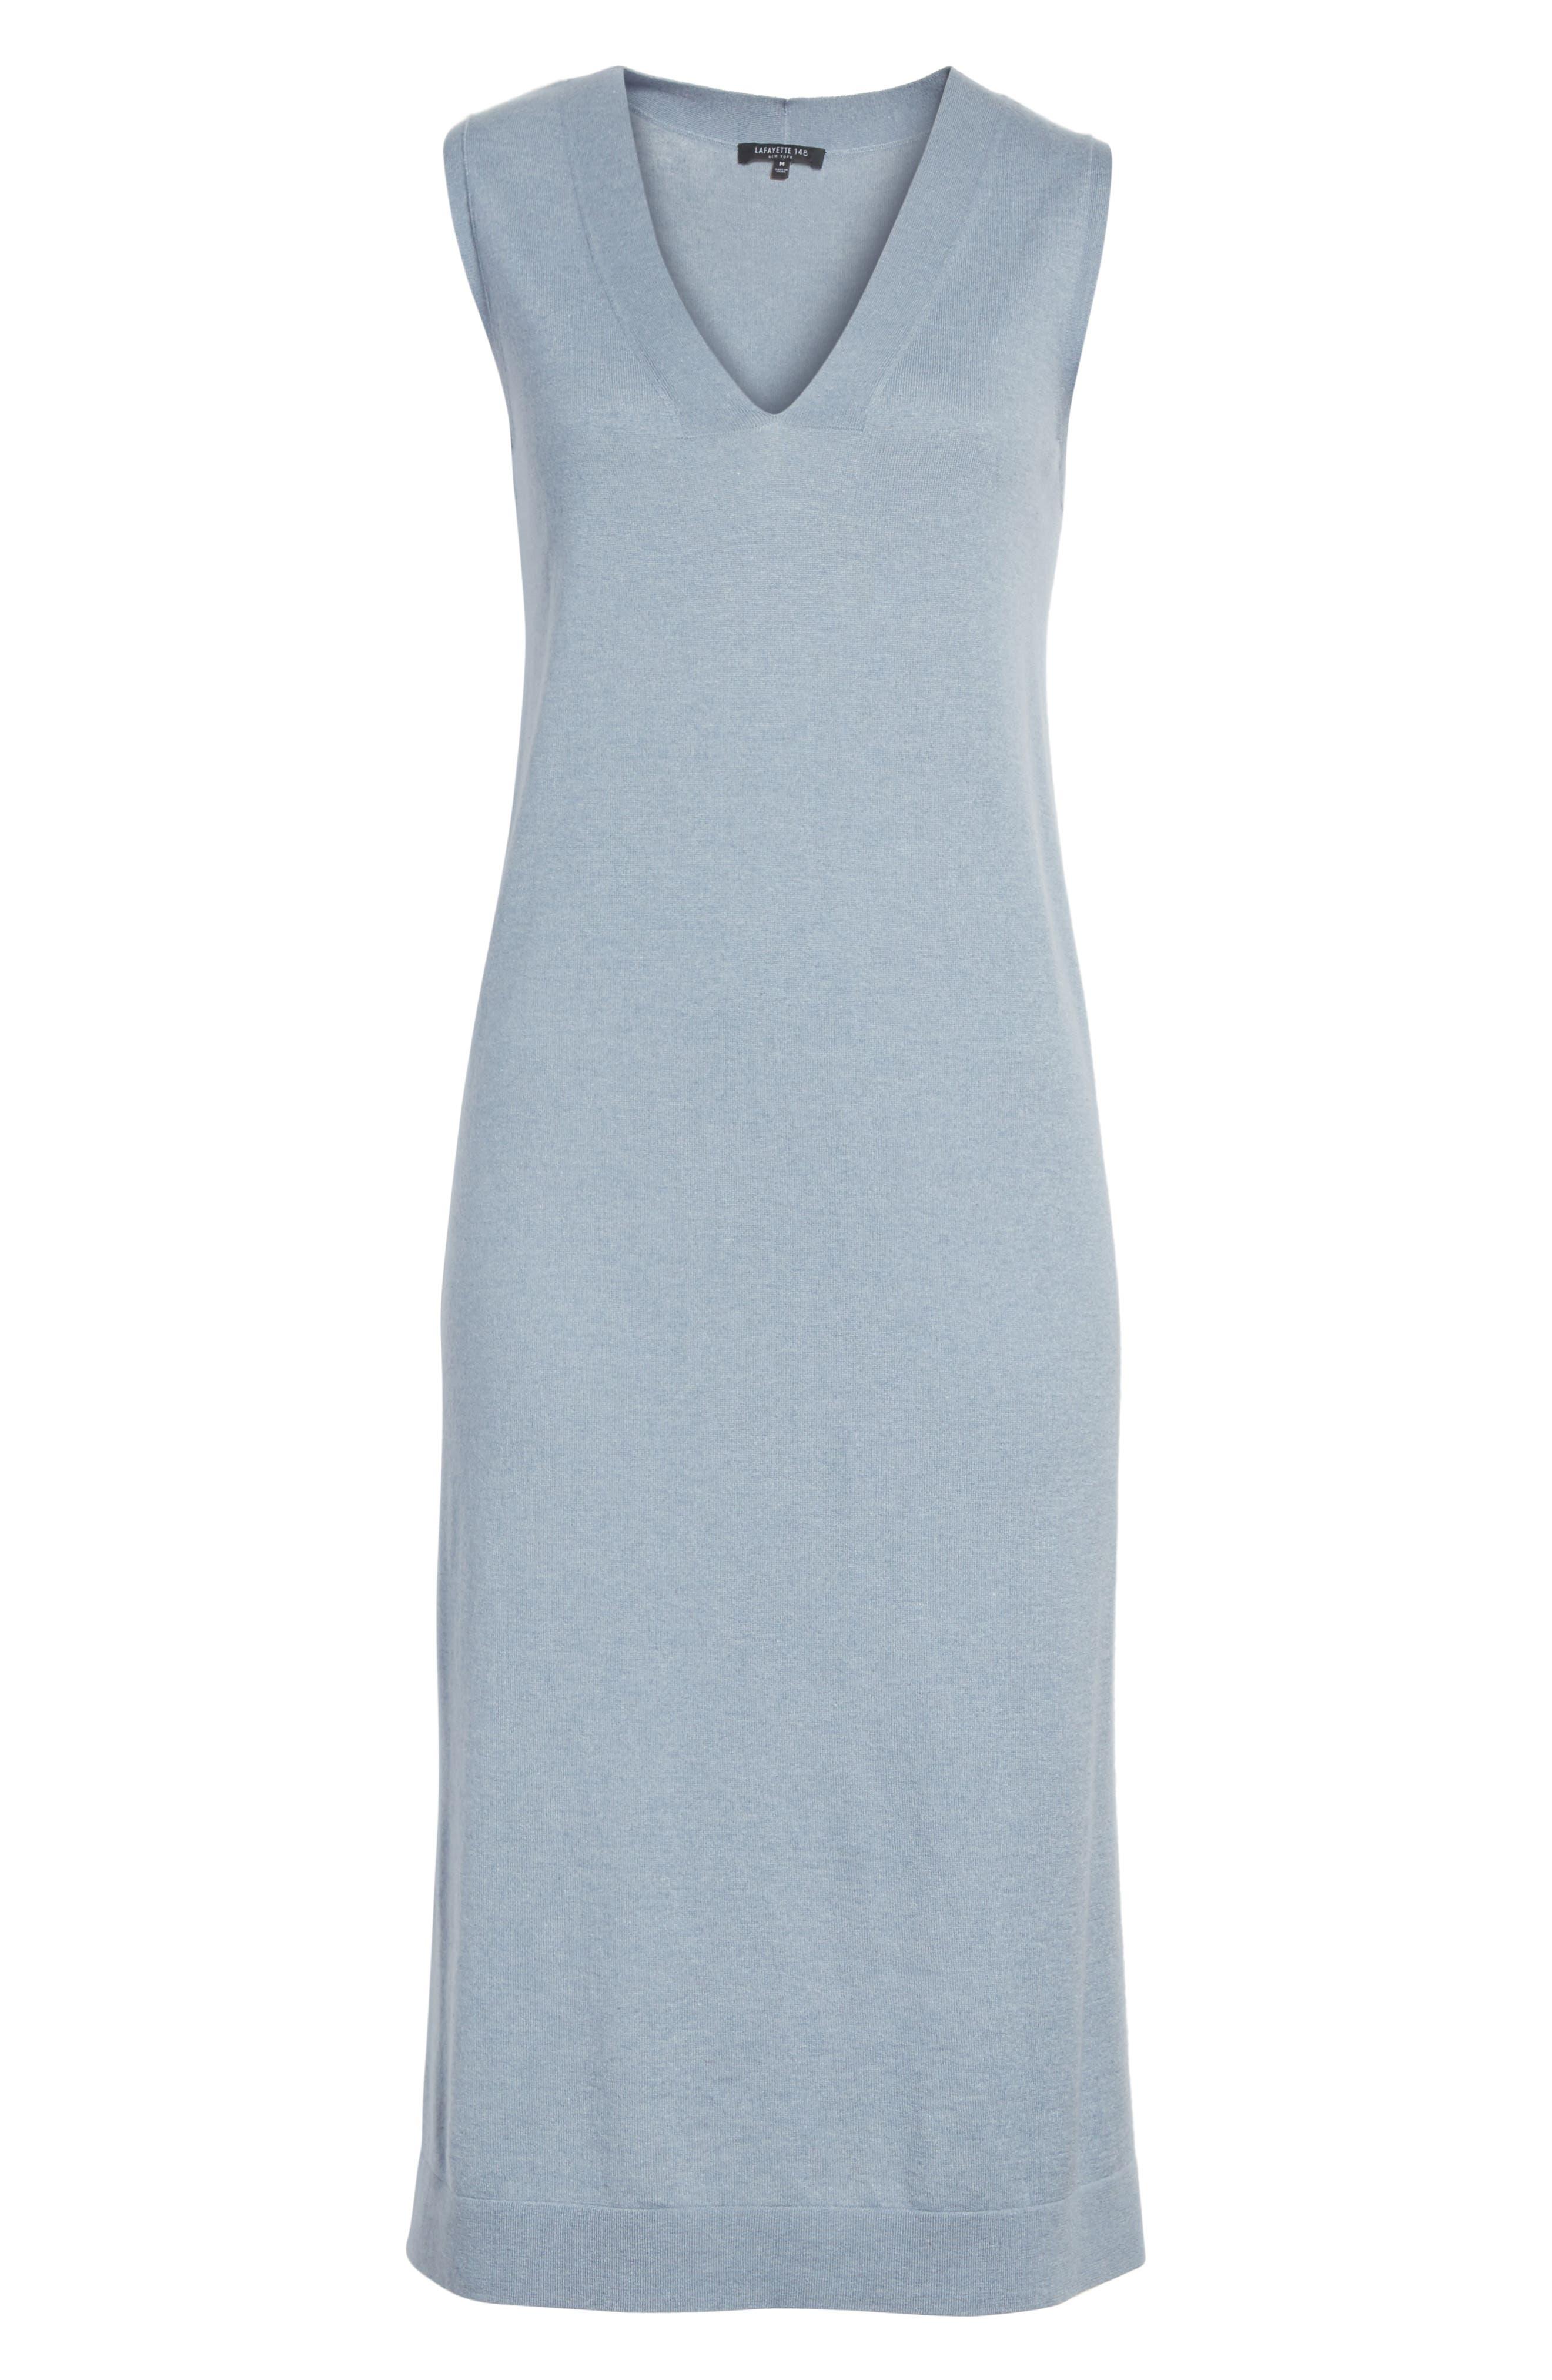 V-Neck Cashmere & Silk Knit Dress,                             Alternate thumbnail 6, color,                             411